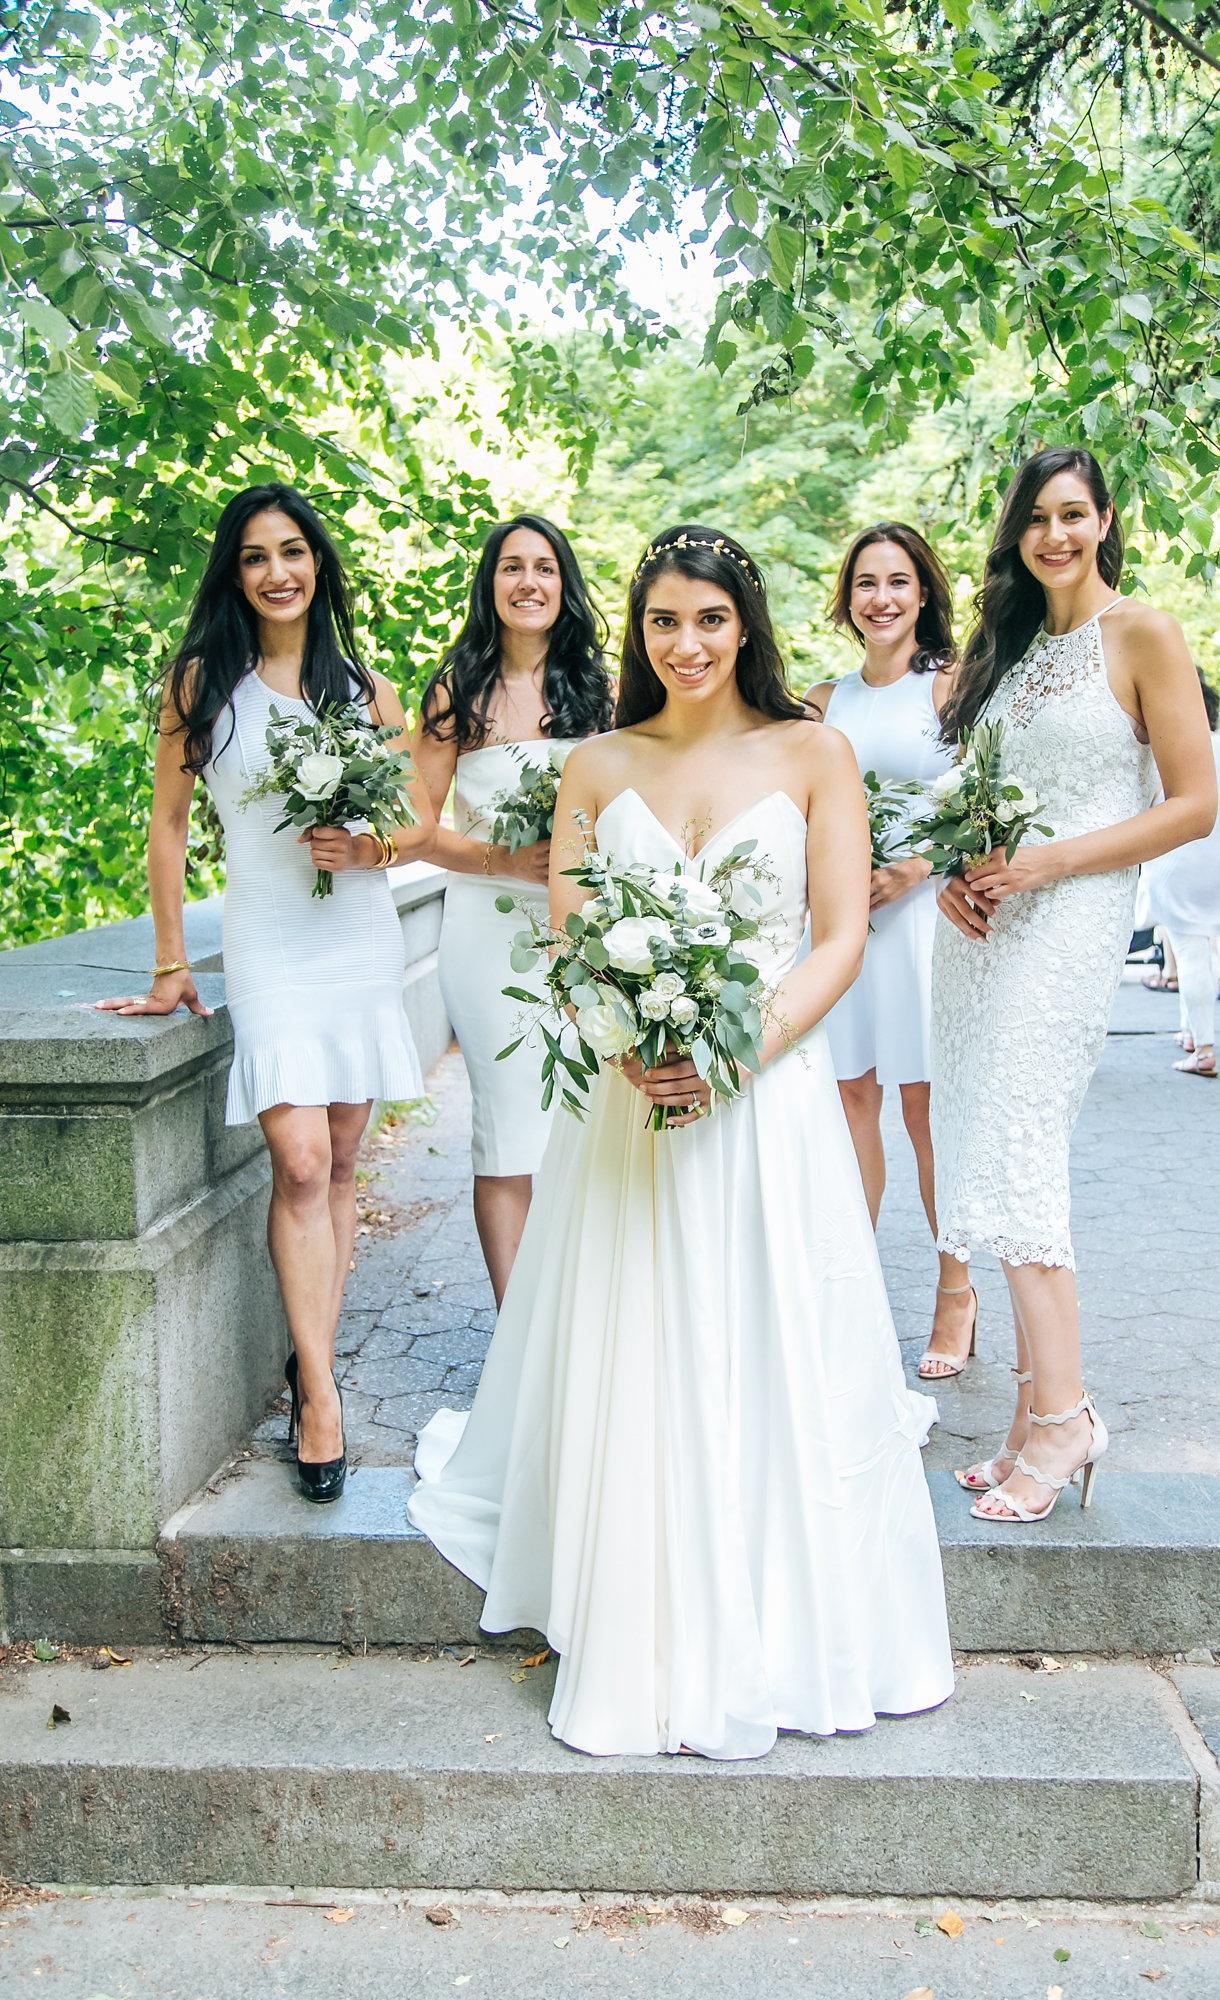 Tall & Small Events NYC, G+N, Modern, Intimate Summer Brooklyn Garden Wedding at the Prospect Park Boat House, Brooklyn New York City. Photo: Sasha B Photo.